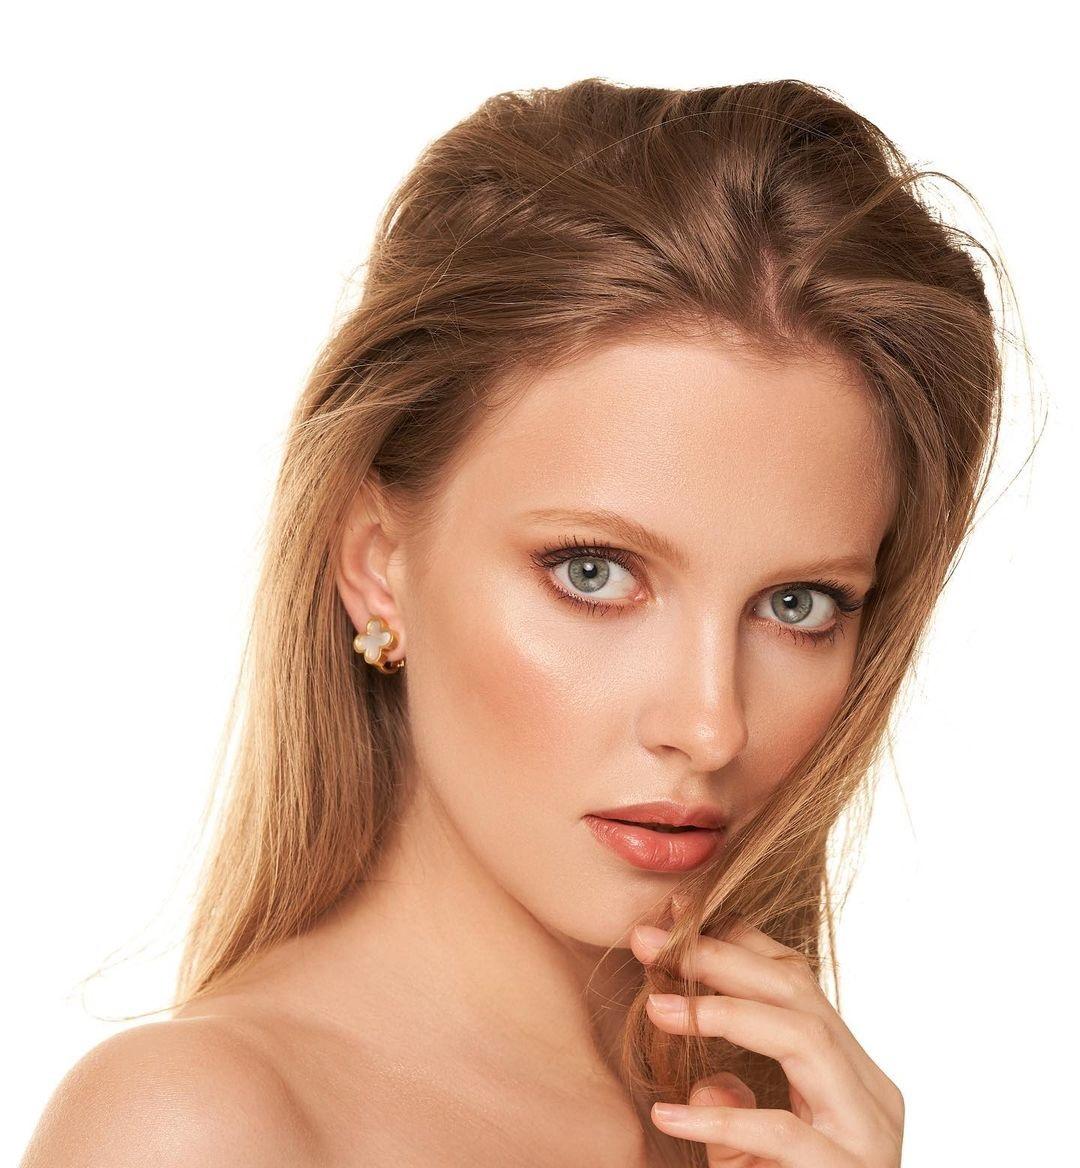 Nicole-marie-j-Wallpapers-Insta-Fit-Bio-15